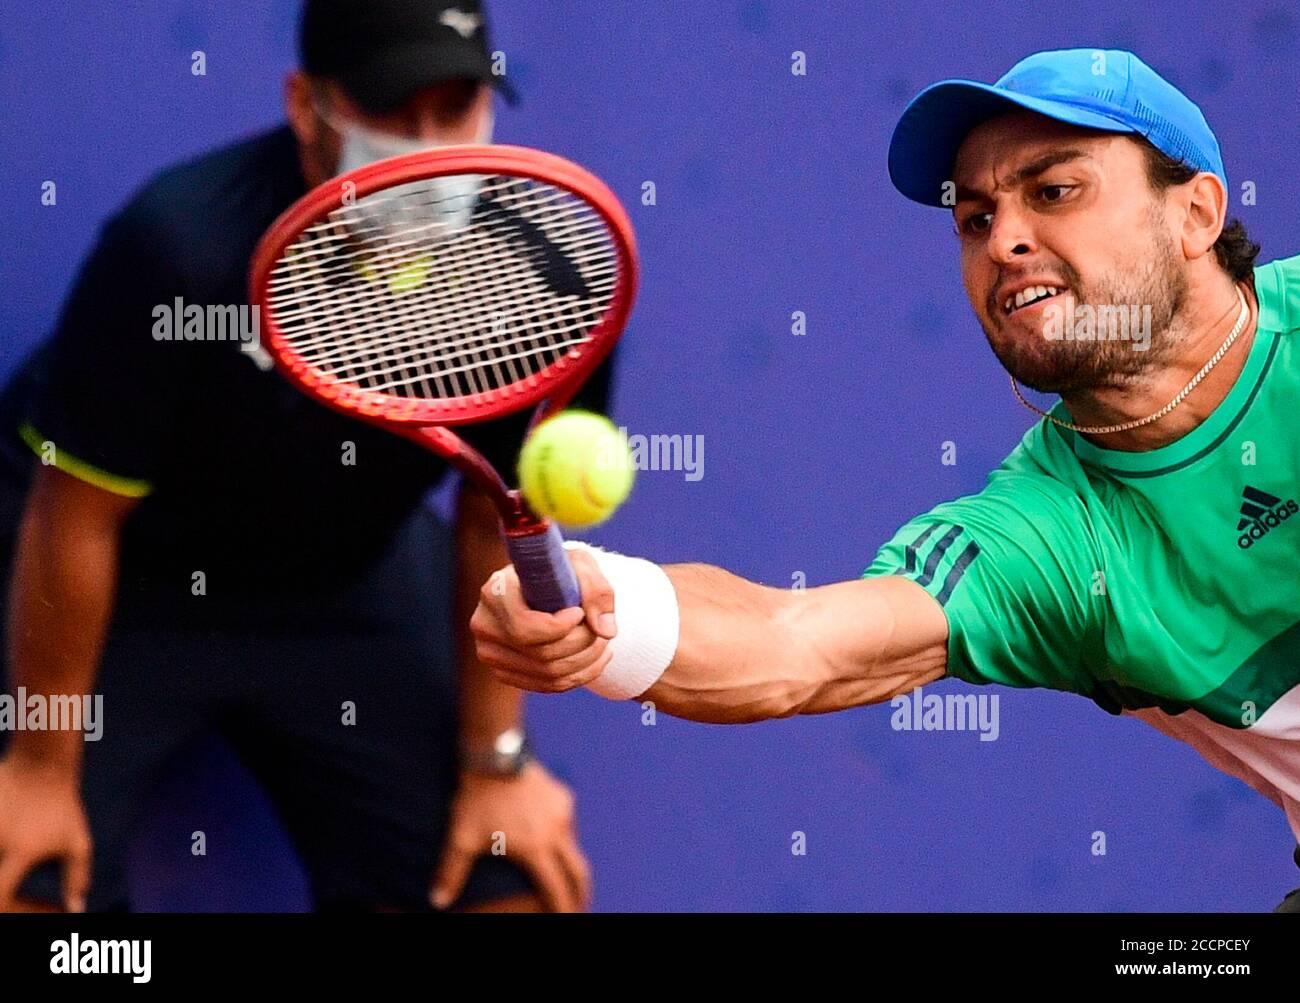 Prague, Czech Republic. 22nd Aug, 2020. Russian tennis player Aslan Karatsev  in action during the I. CLTK Prague Open of the ATP Challenger Tour match  against Swiss Stanislas